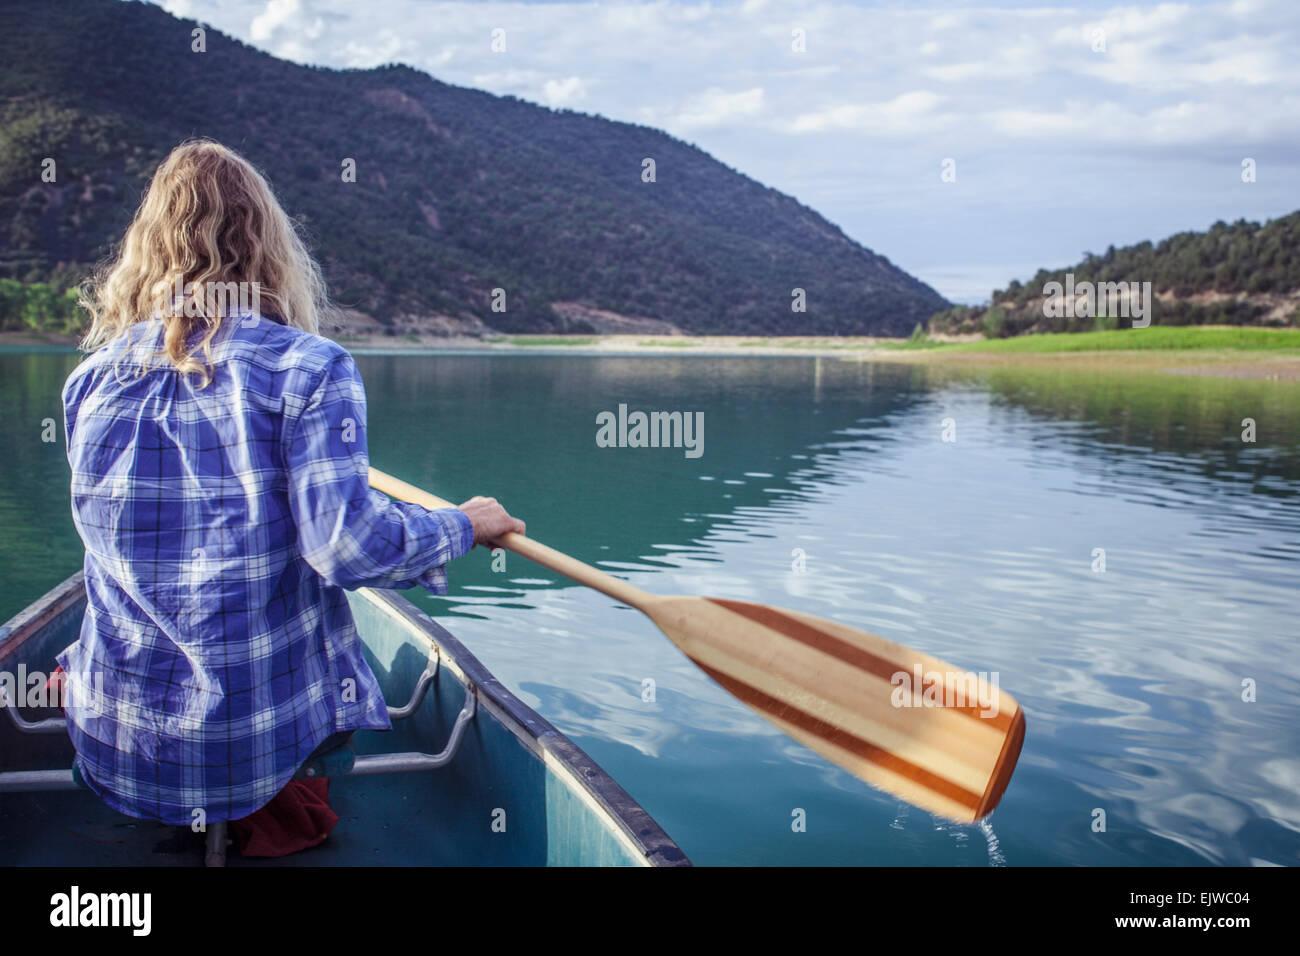 USA, Colorado, Harvey Gap, Woman canoeing in lake - Stock Image